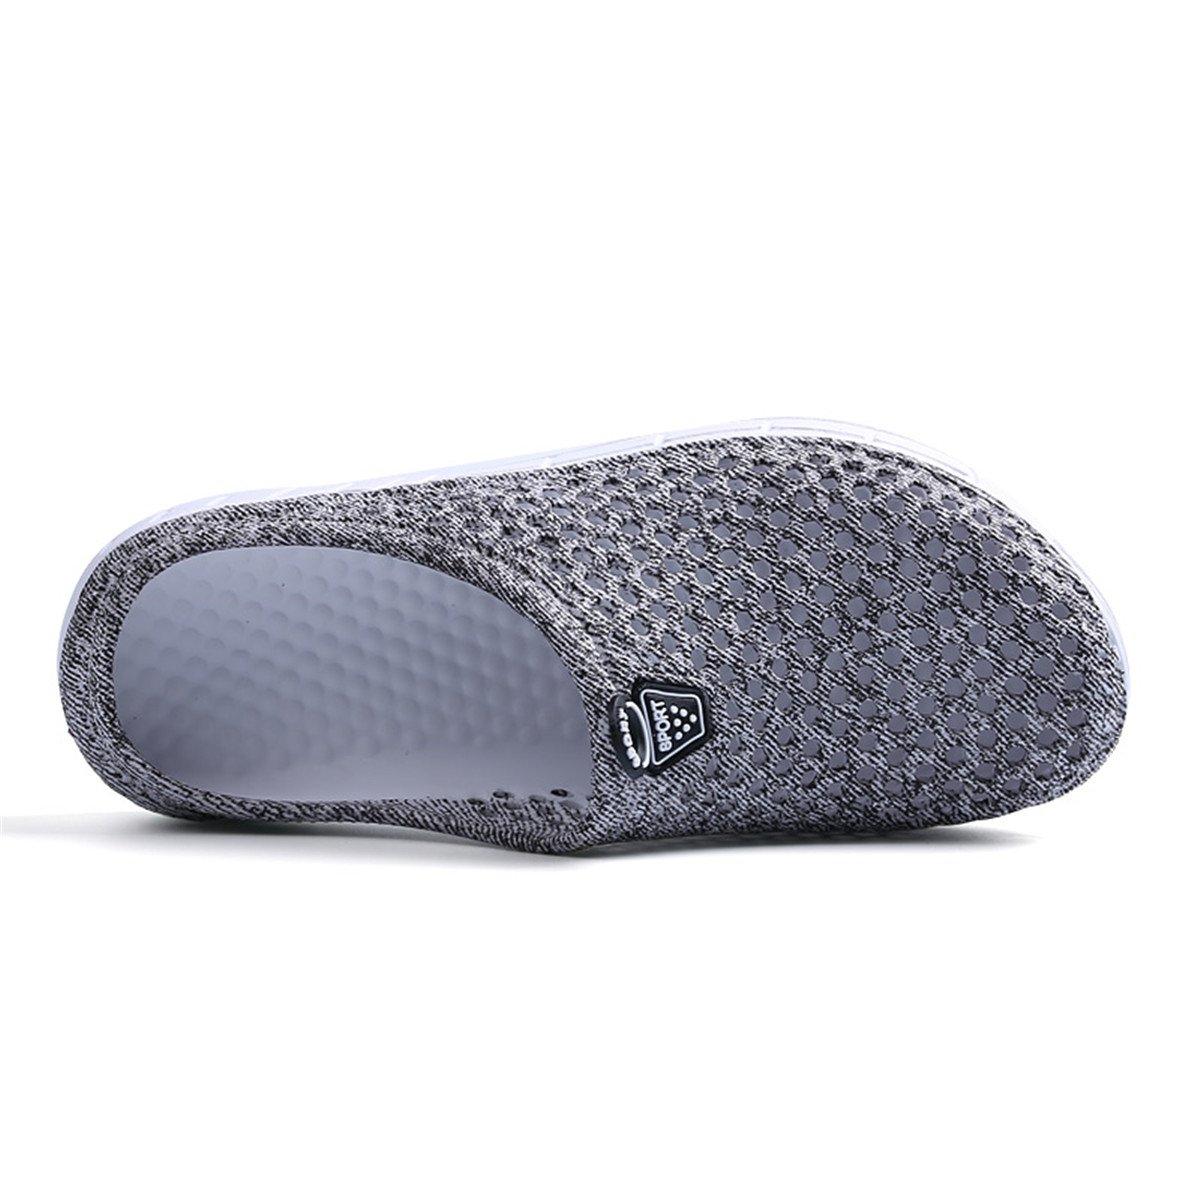 Ginjang Women's Garden Clogs Shoes Slip-on Slippers Sandals(38/Gray) by Ginjang (Image #3)